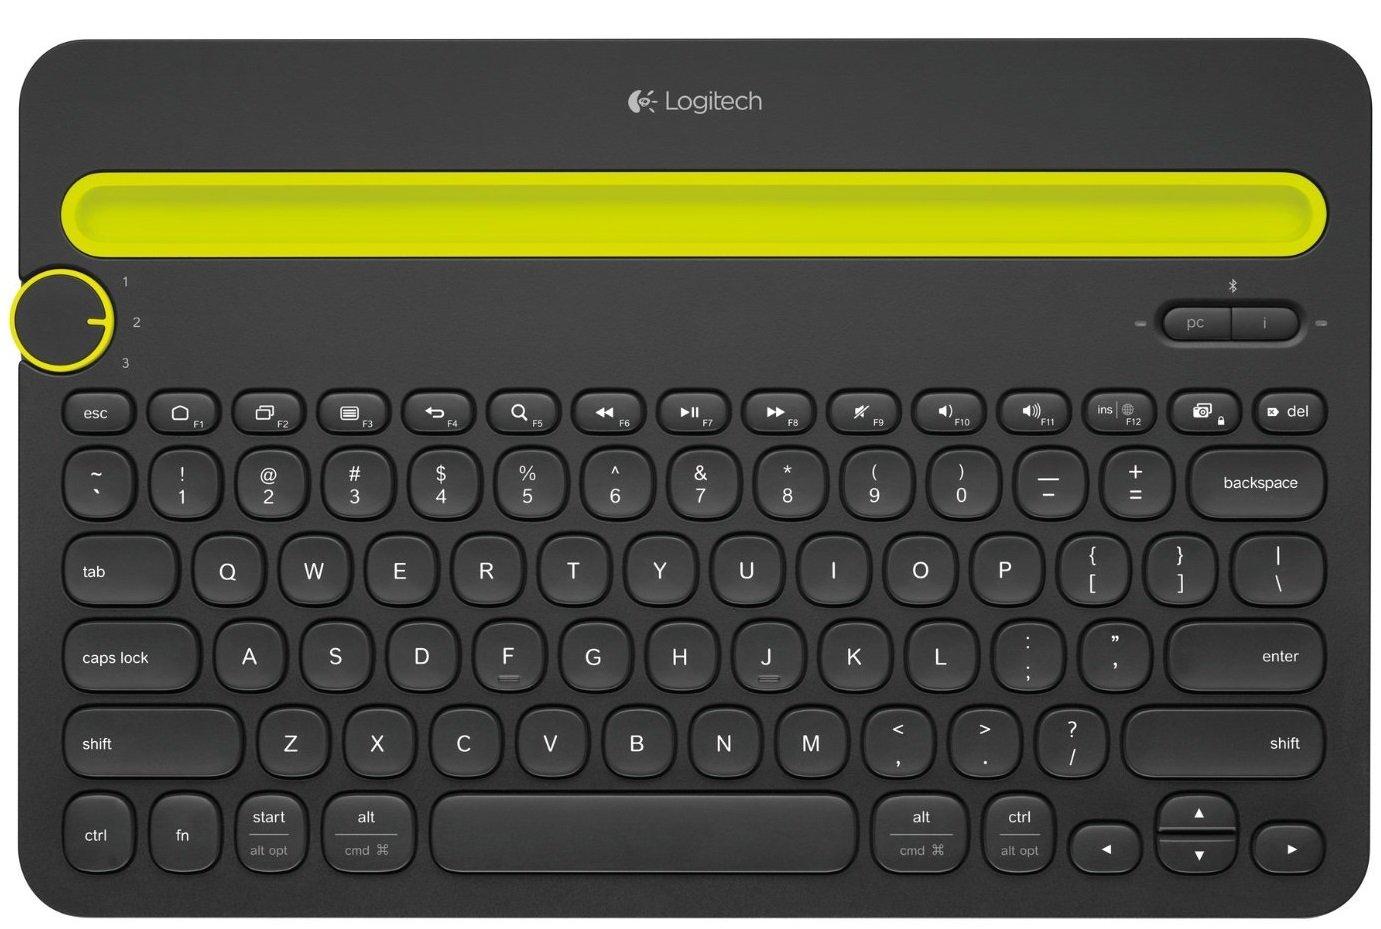 Logitech-клавиатура-1